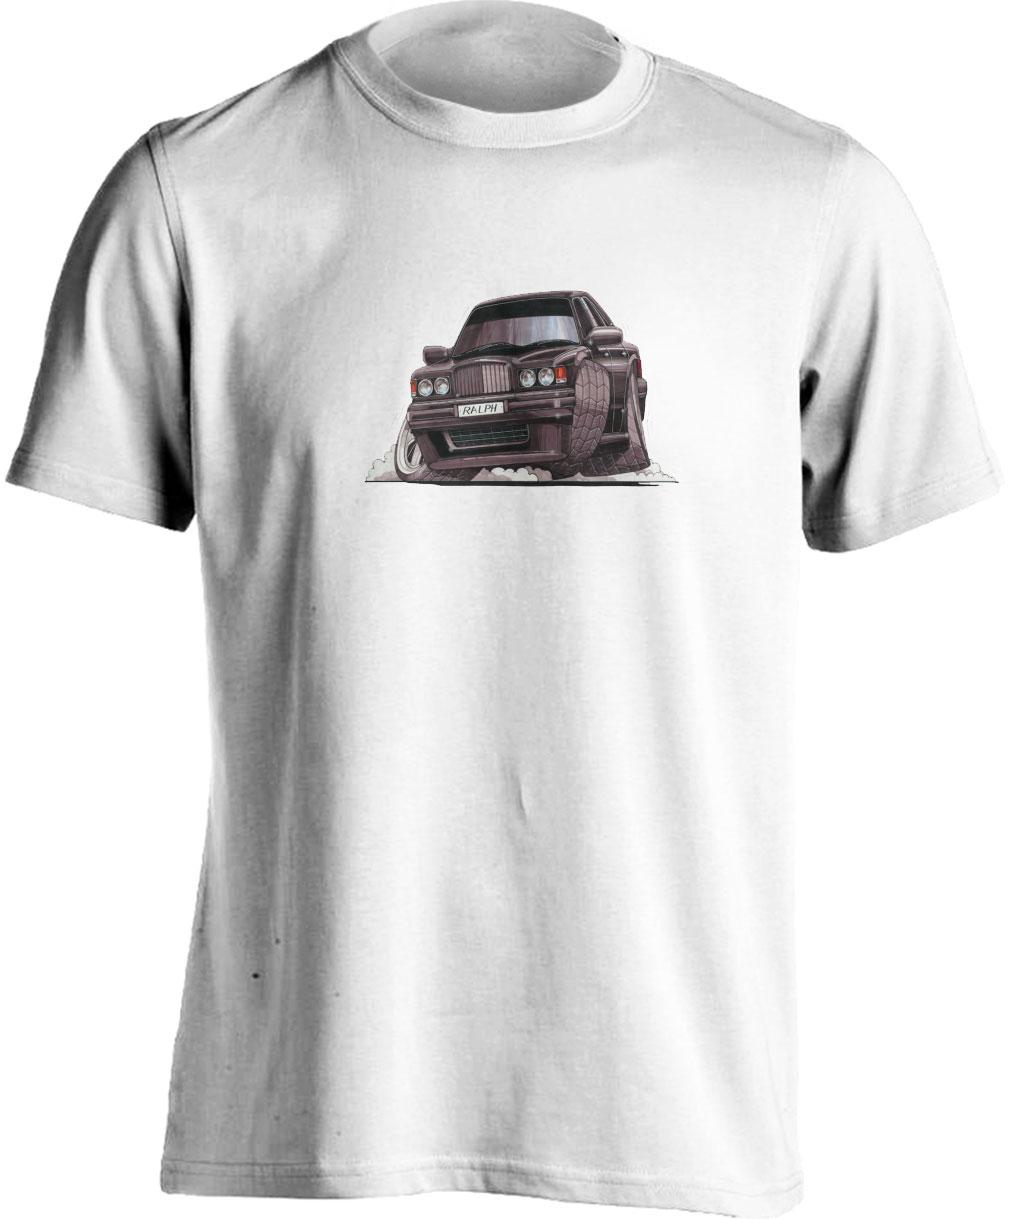 Koolart Bentley Type R Turbo Black-0673-Adults Unisex T Shirt